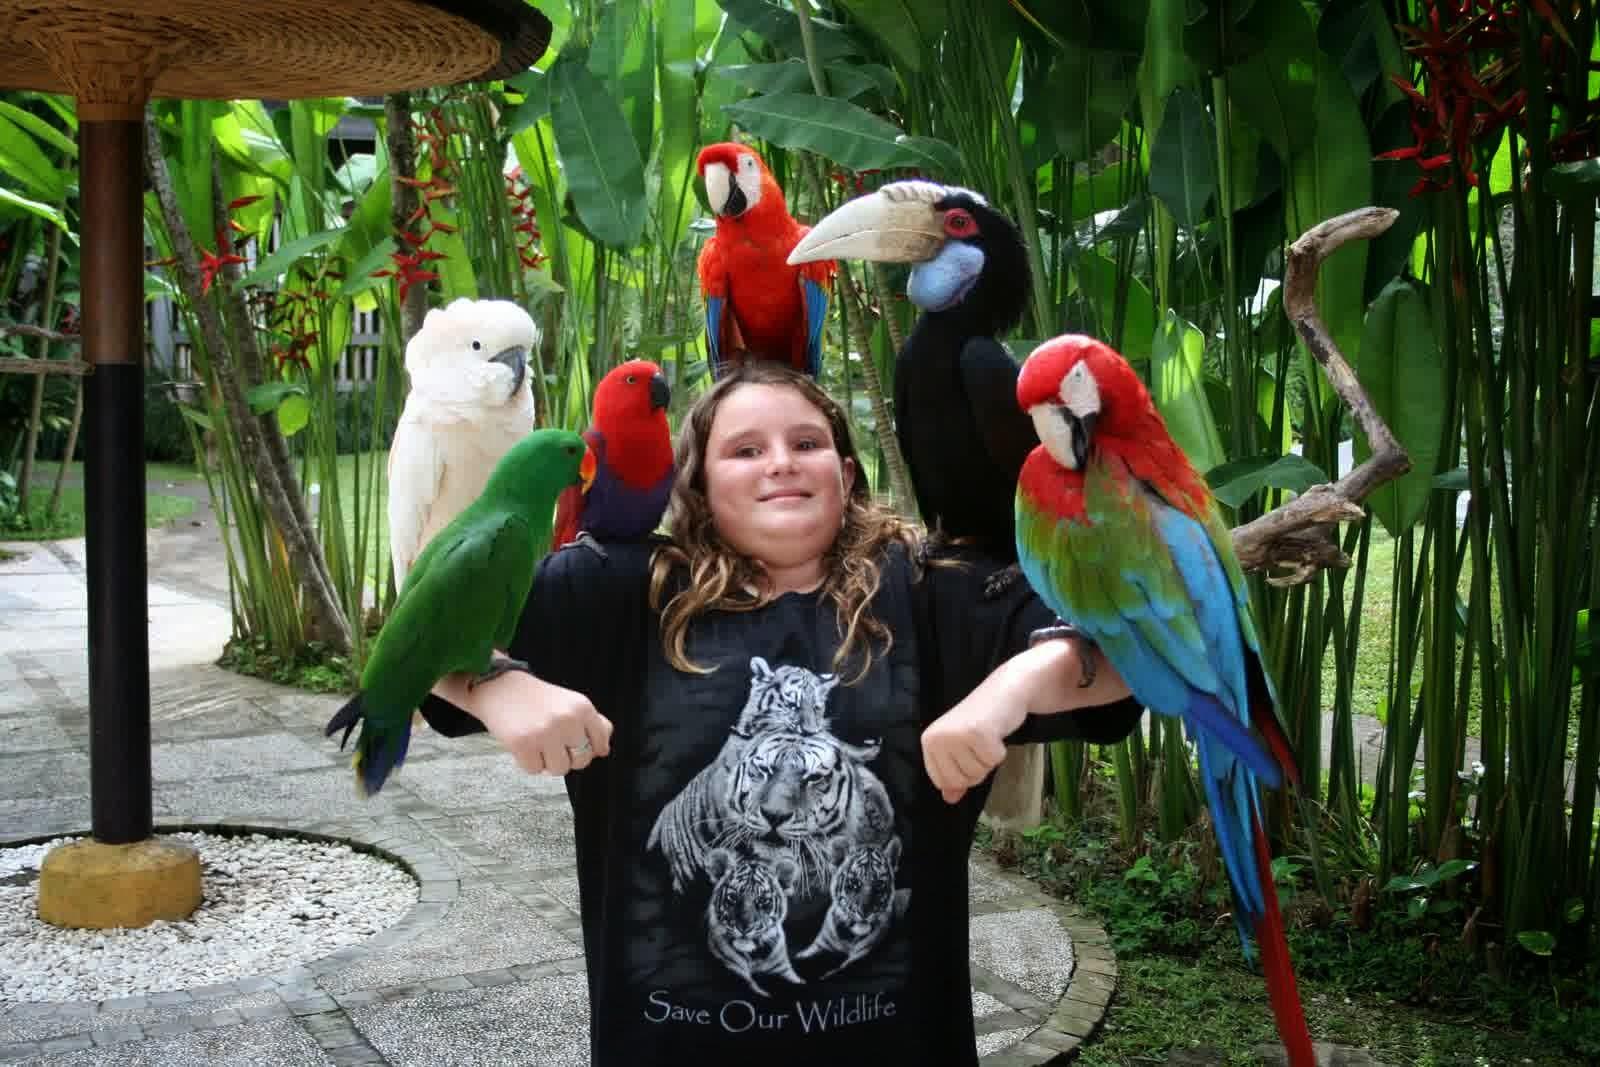 Tempat Wisata Di Bali Bird Park Voucher Tiket Masuk Anak